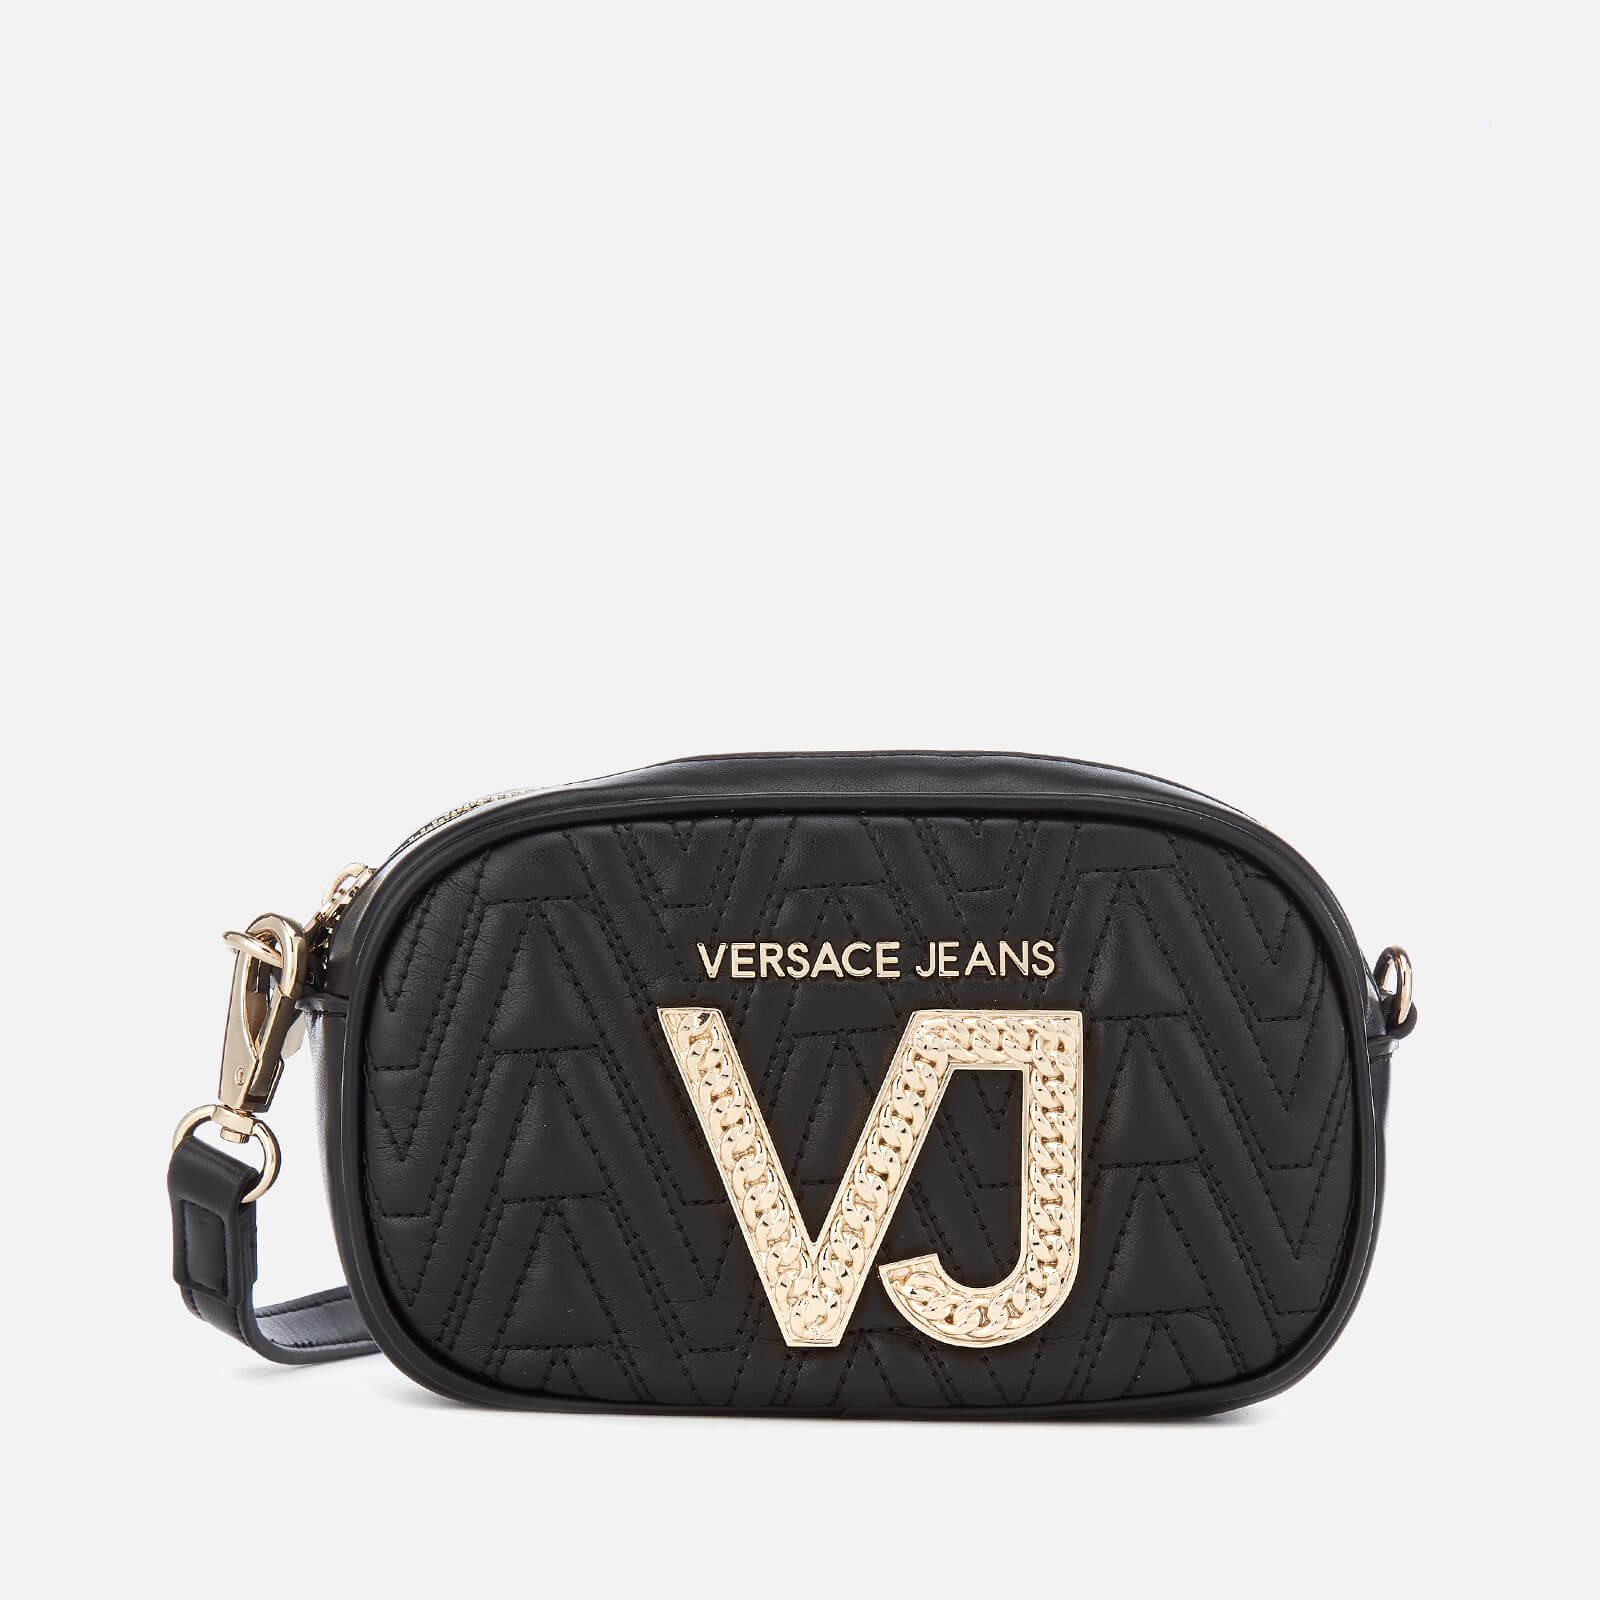 0ba719cf0533 Lyst - Versace Jeans Diamonte Vj Cross Body Bag in Black